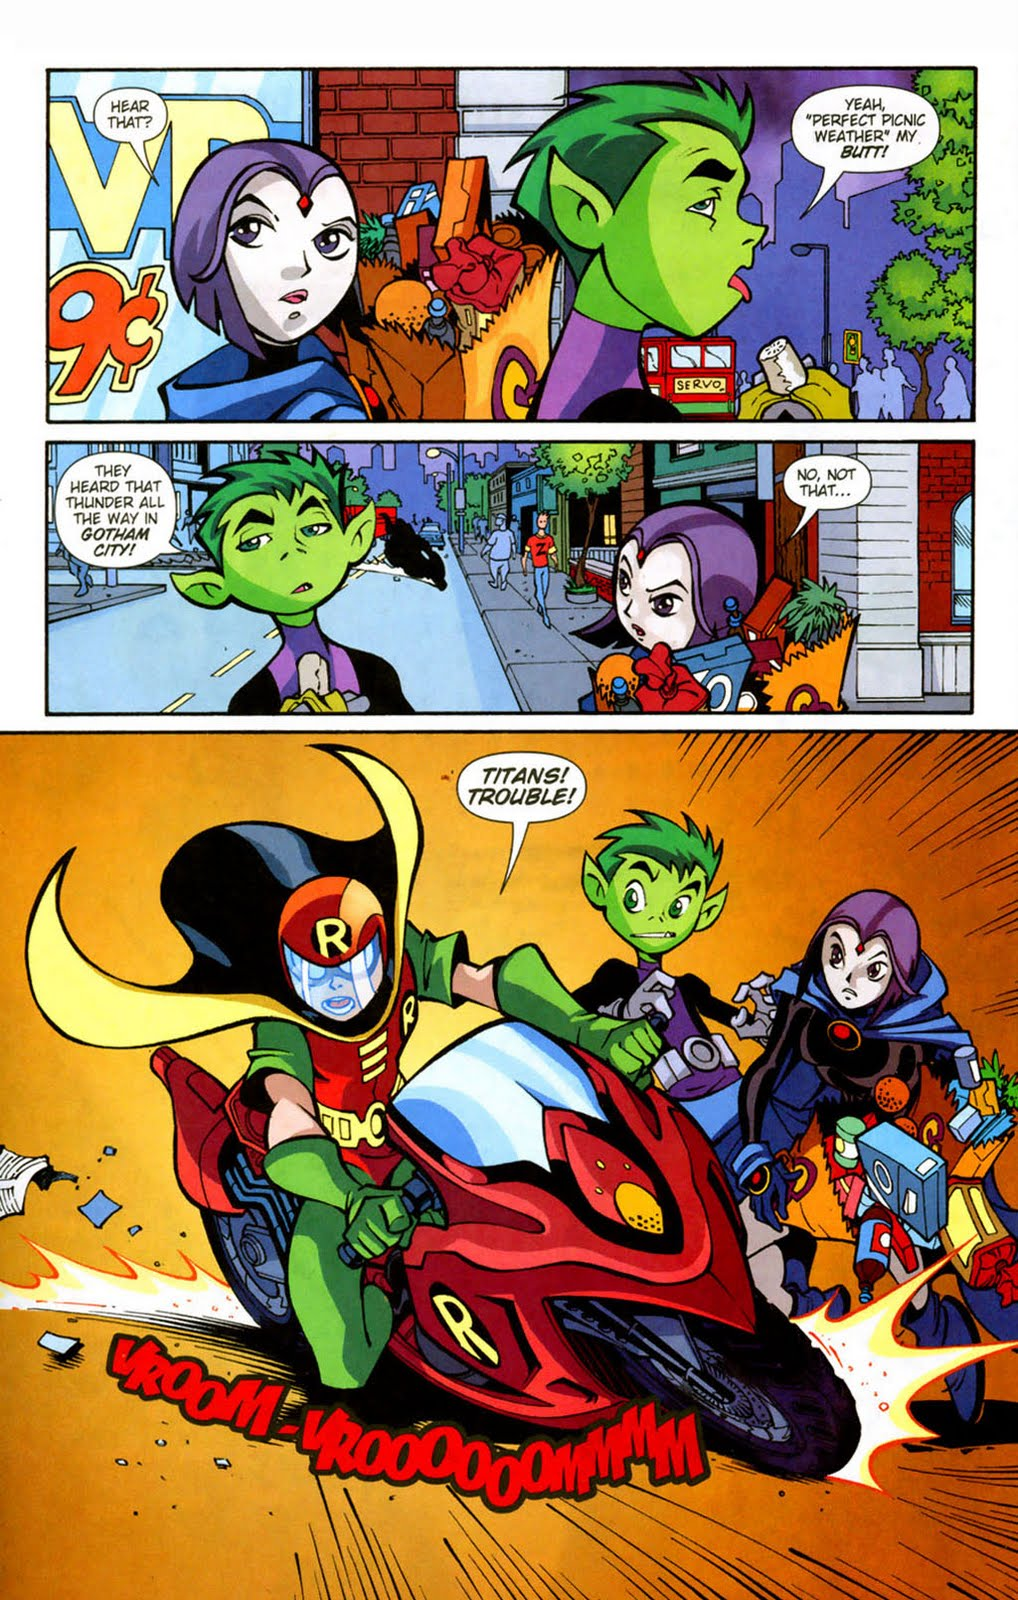 Go To Www Bing Comhella: Teen Titans GO!: #6 Storm